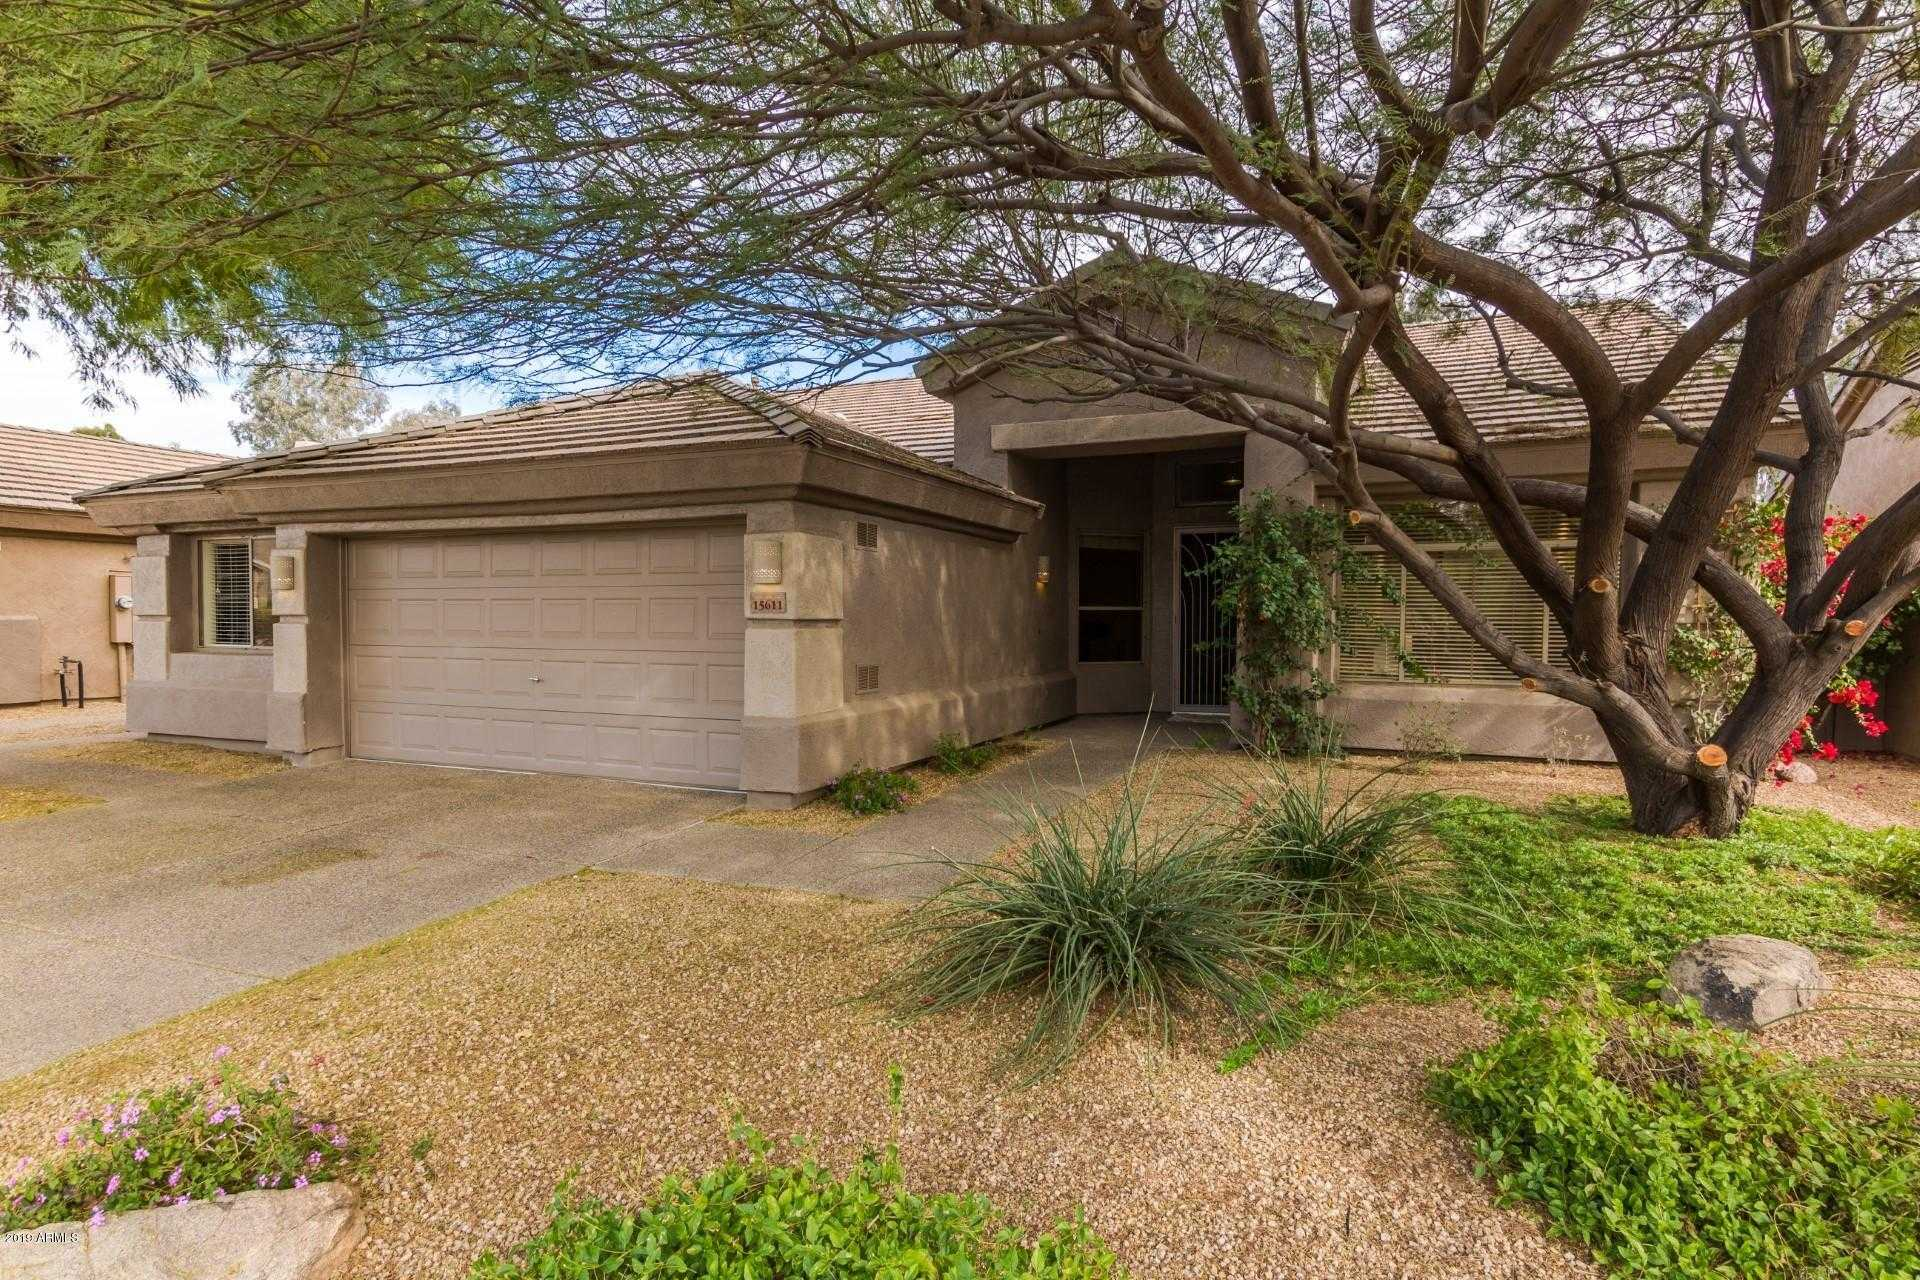 $539,500 - 4Br/2Ba - Home for Sale in Kierland Parcels 10a,10c & 11, Scottsdale